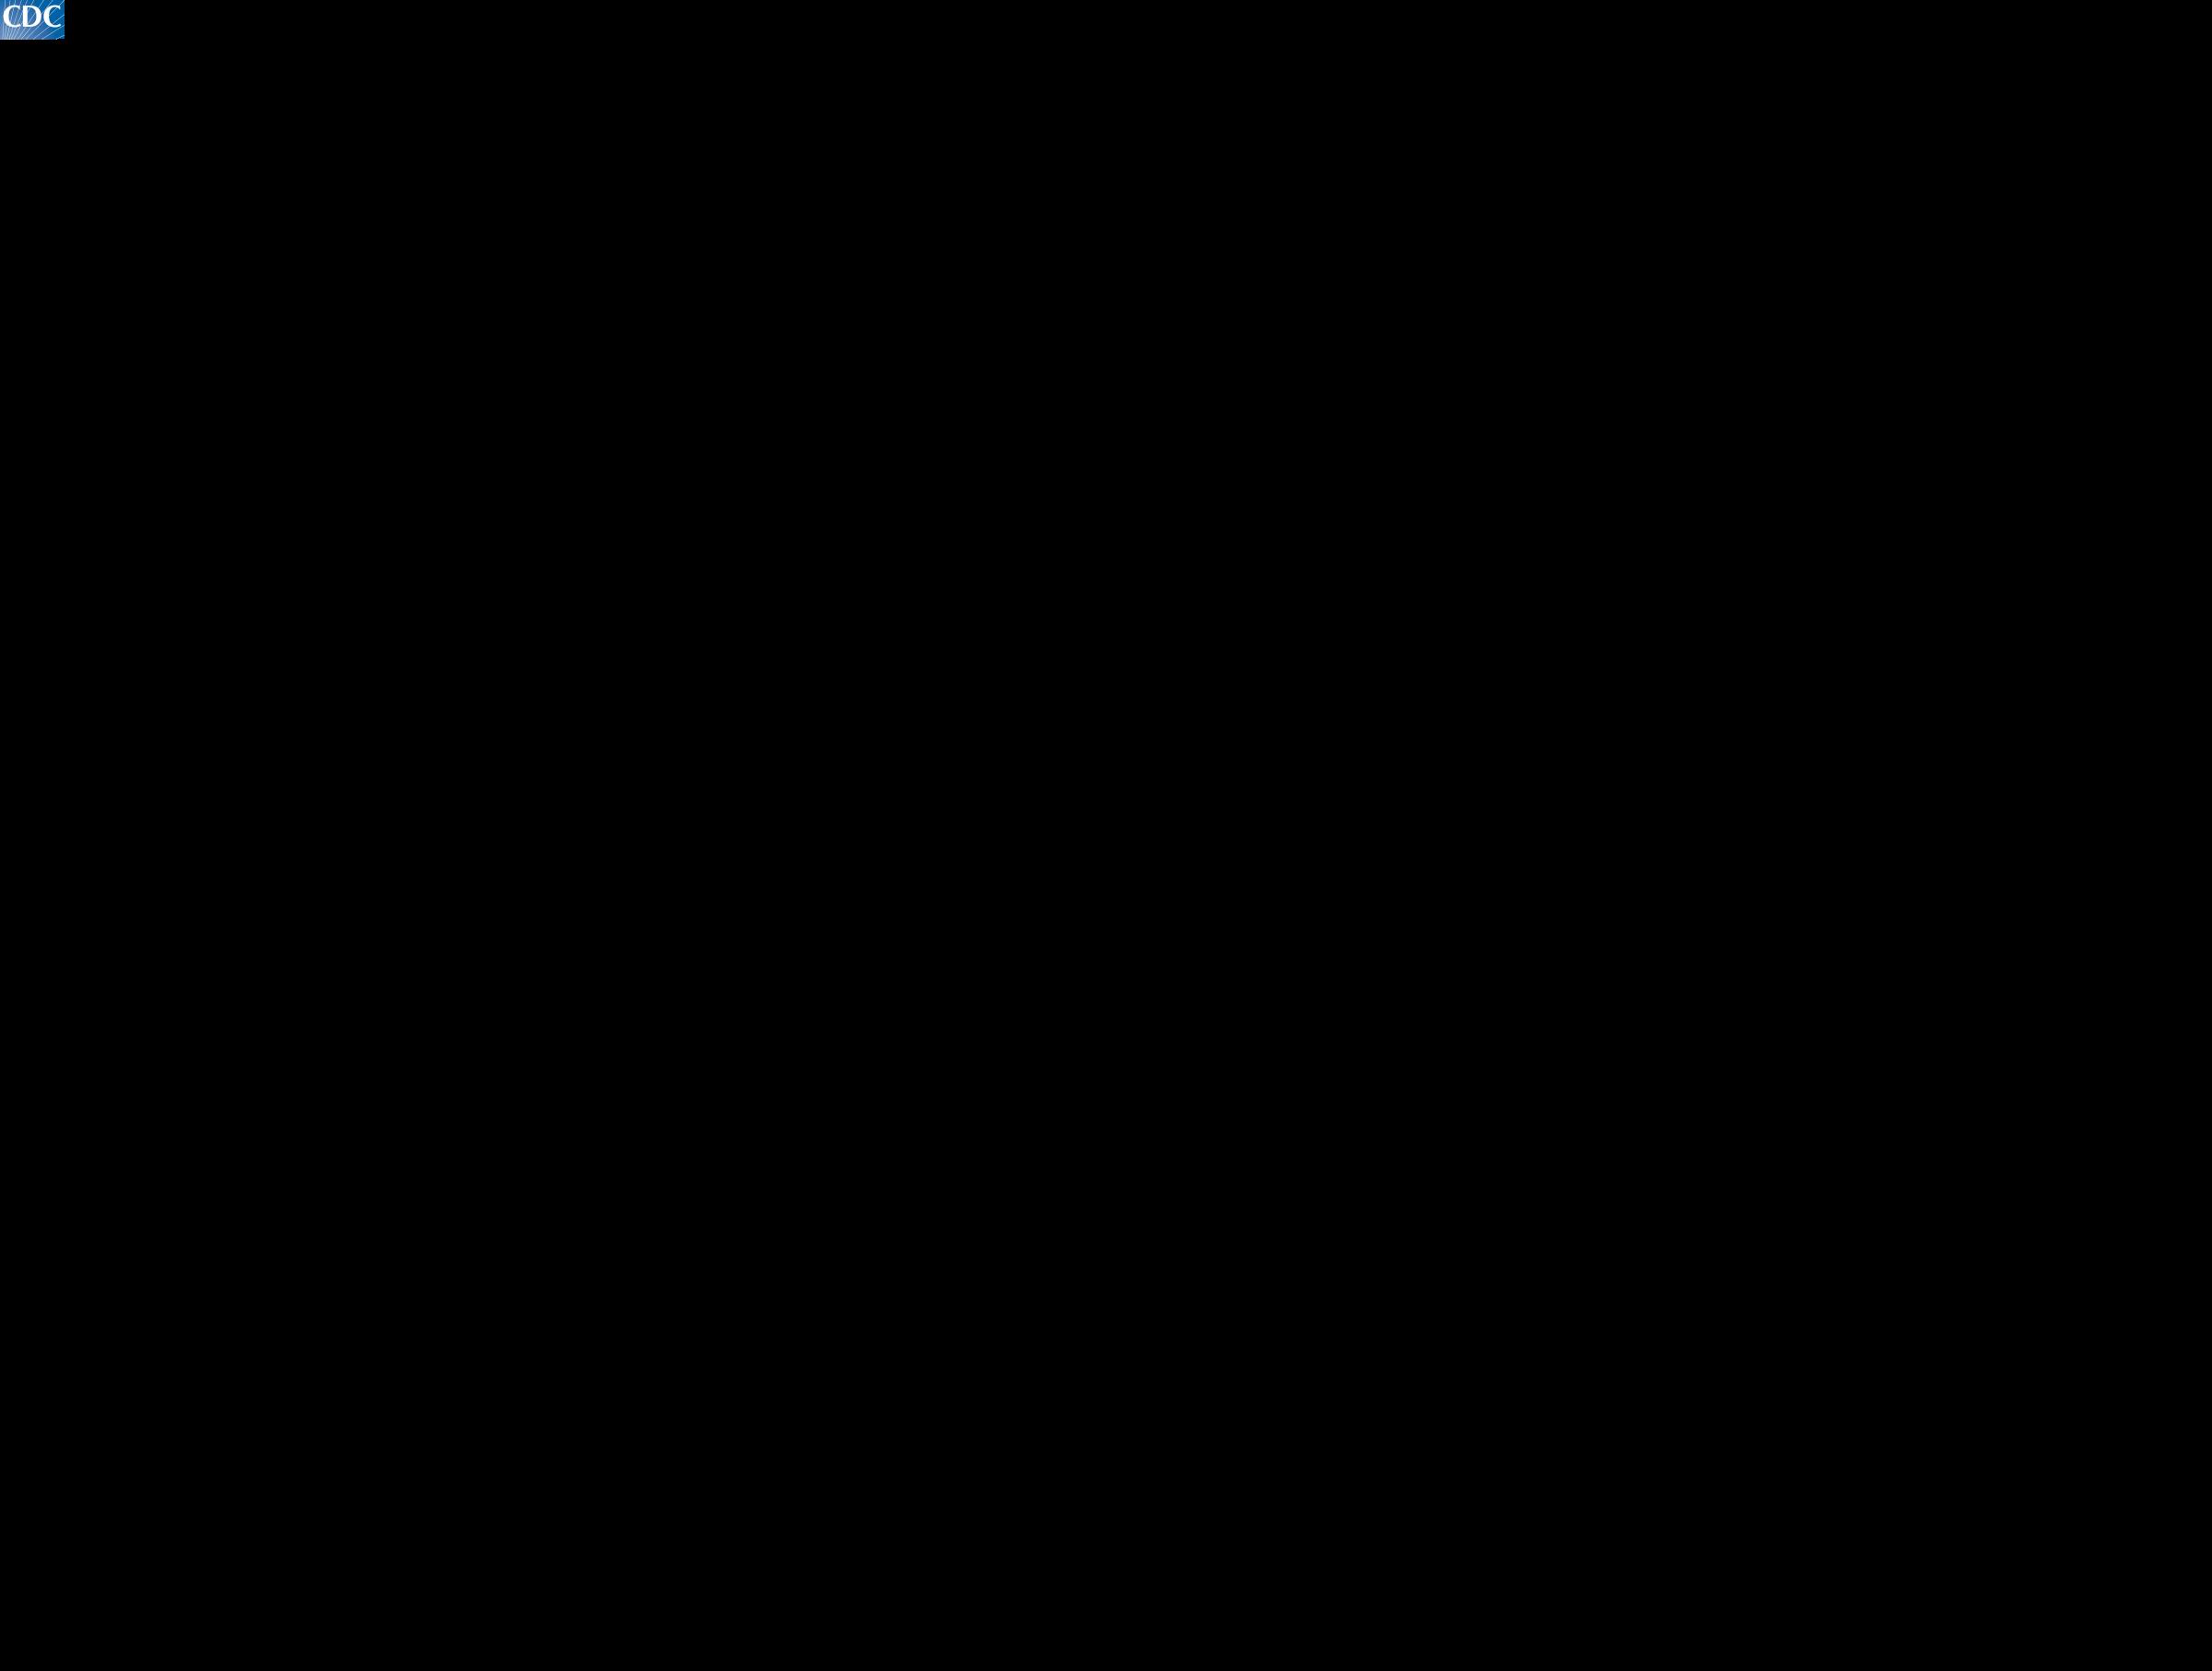 CDC Logo PNG Transparent & SVG Vector - Freebie Supply